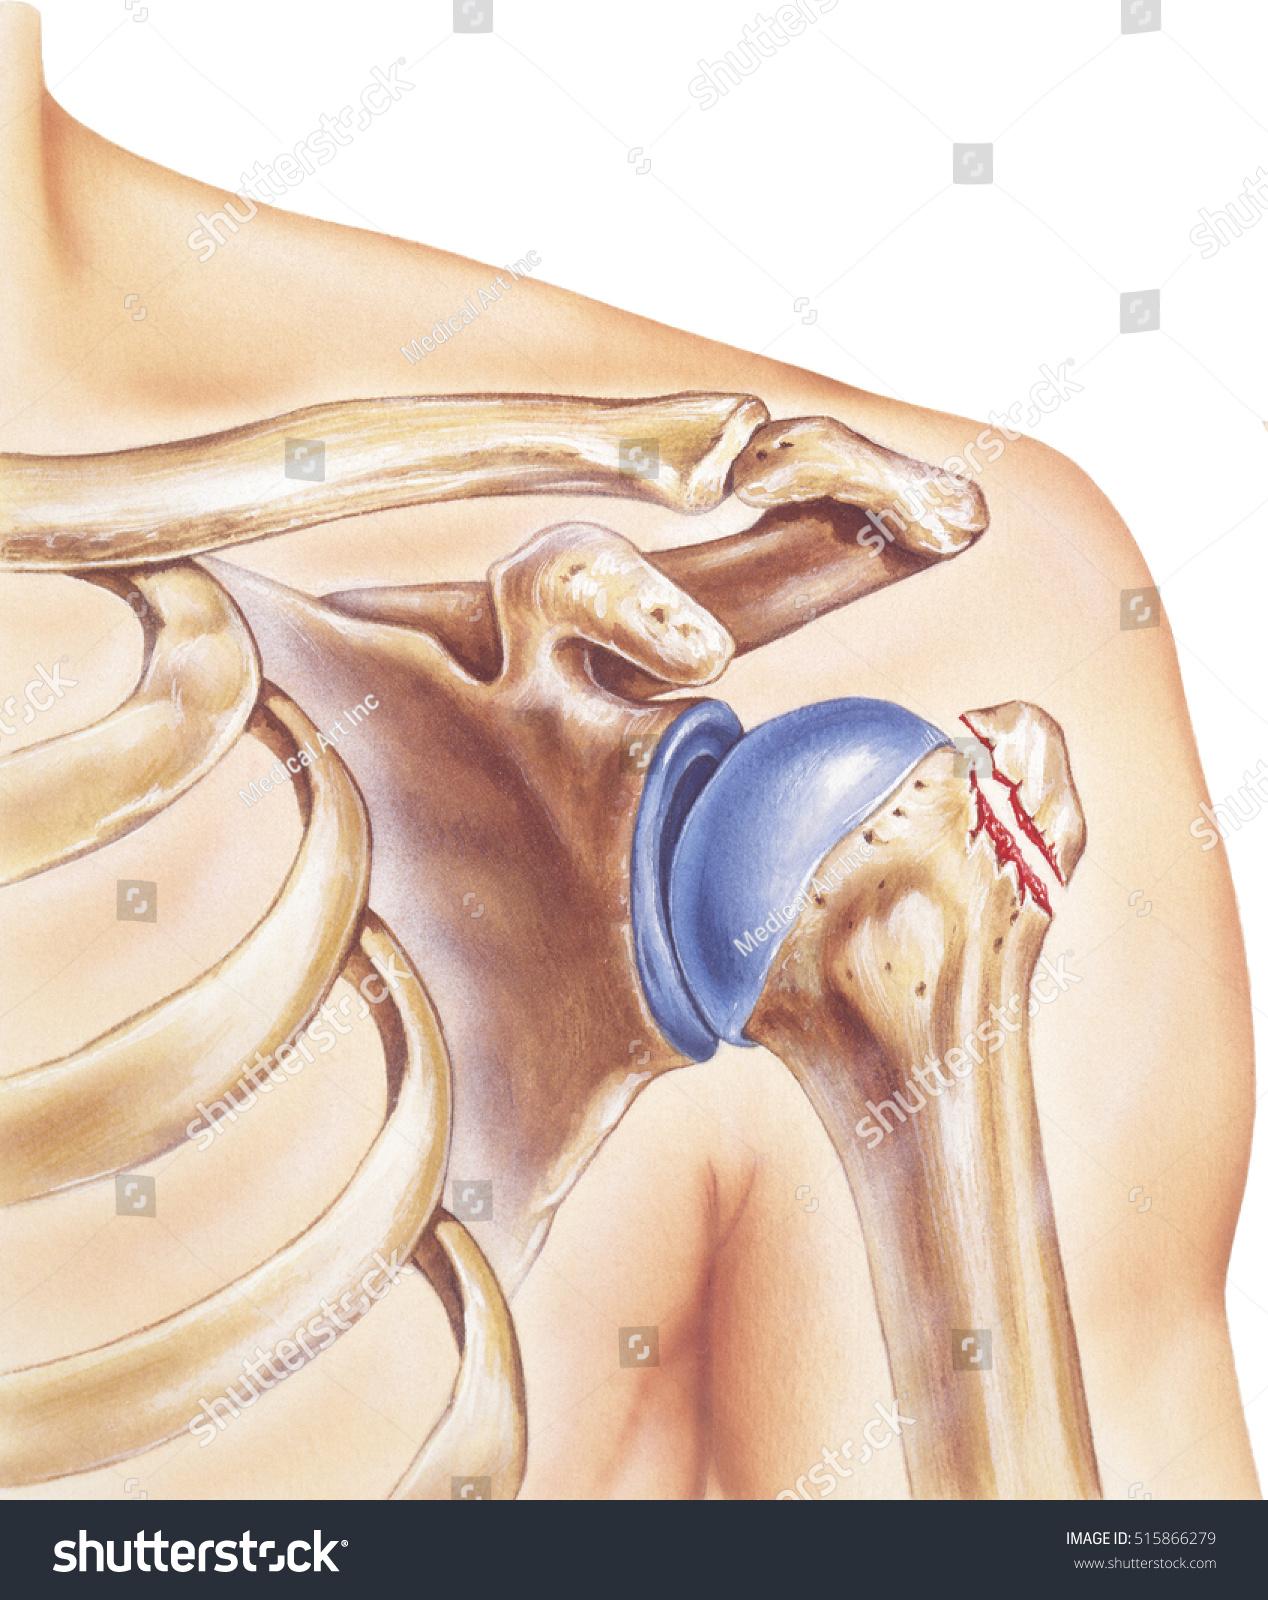 Royalty Free Stock Illustration Of Shoulder Broken Greater Tubercle